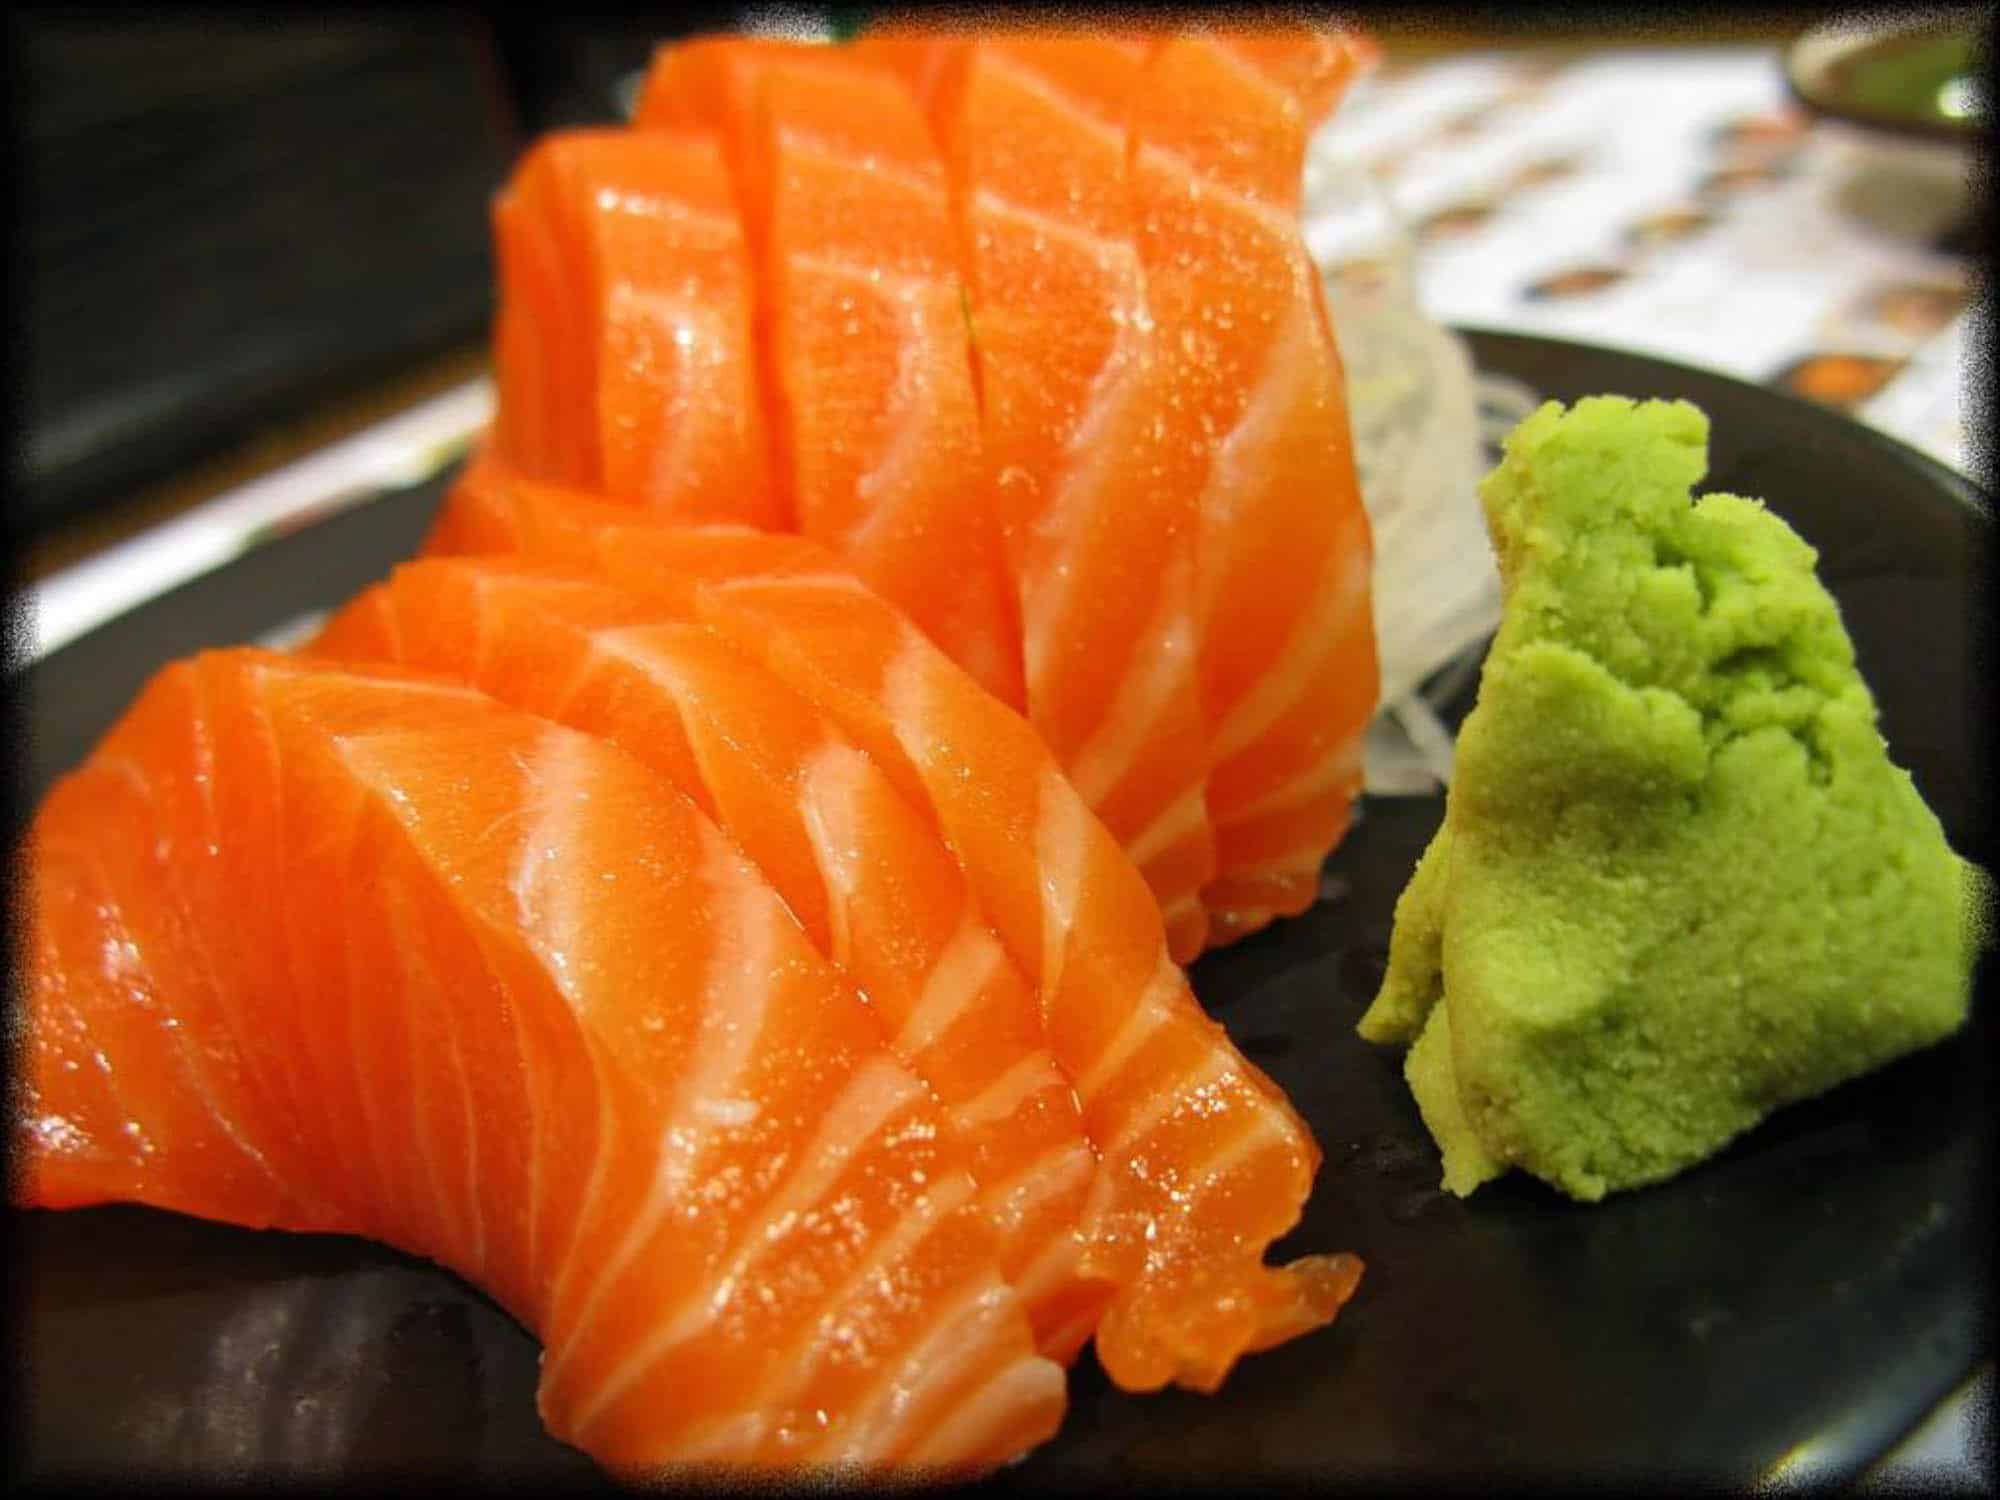 The fish seafood guide gentleman 39 s gazette for Sashimi grade fish